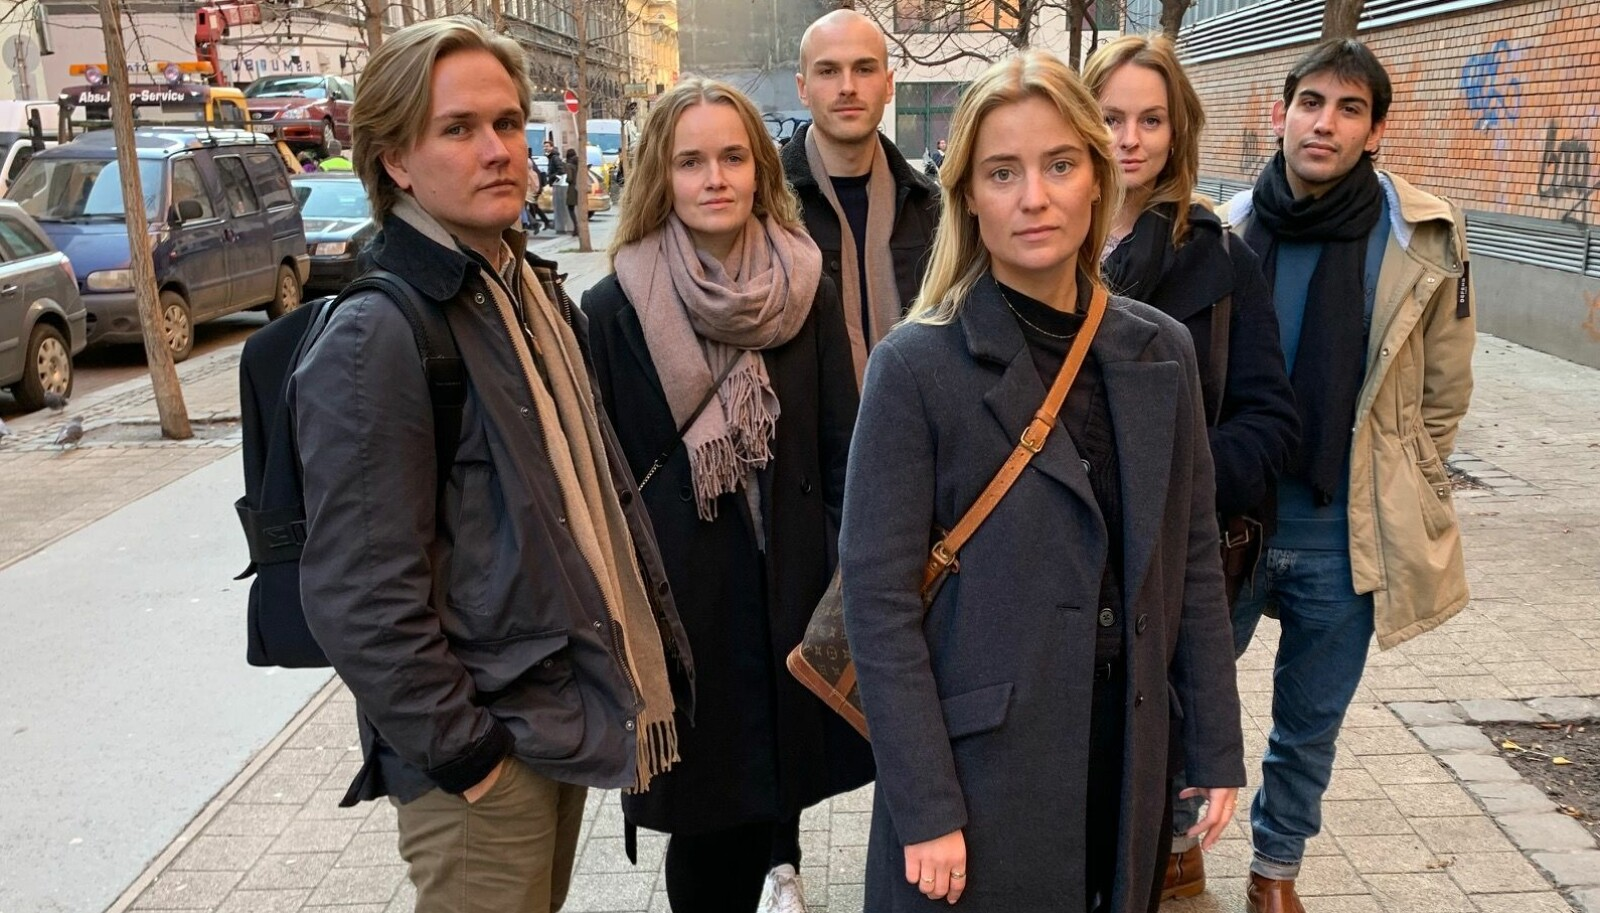 Markus Lien, Malin Moland, Vetle Opaas, Heidi Sundby, Julie Daae og Tomas Larsen.